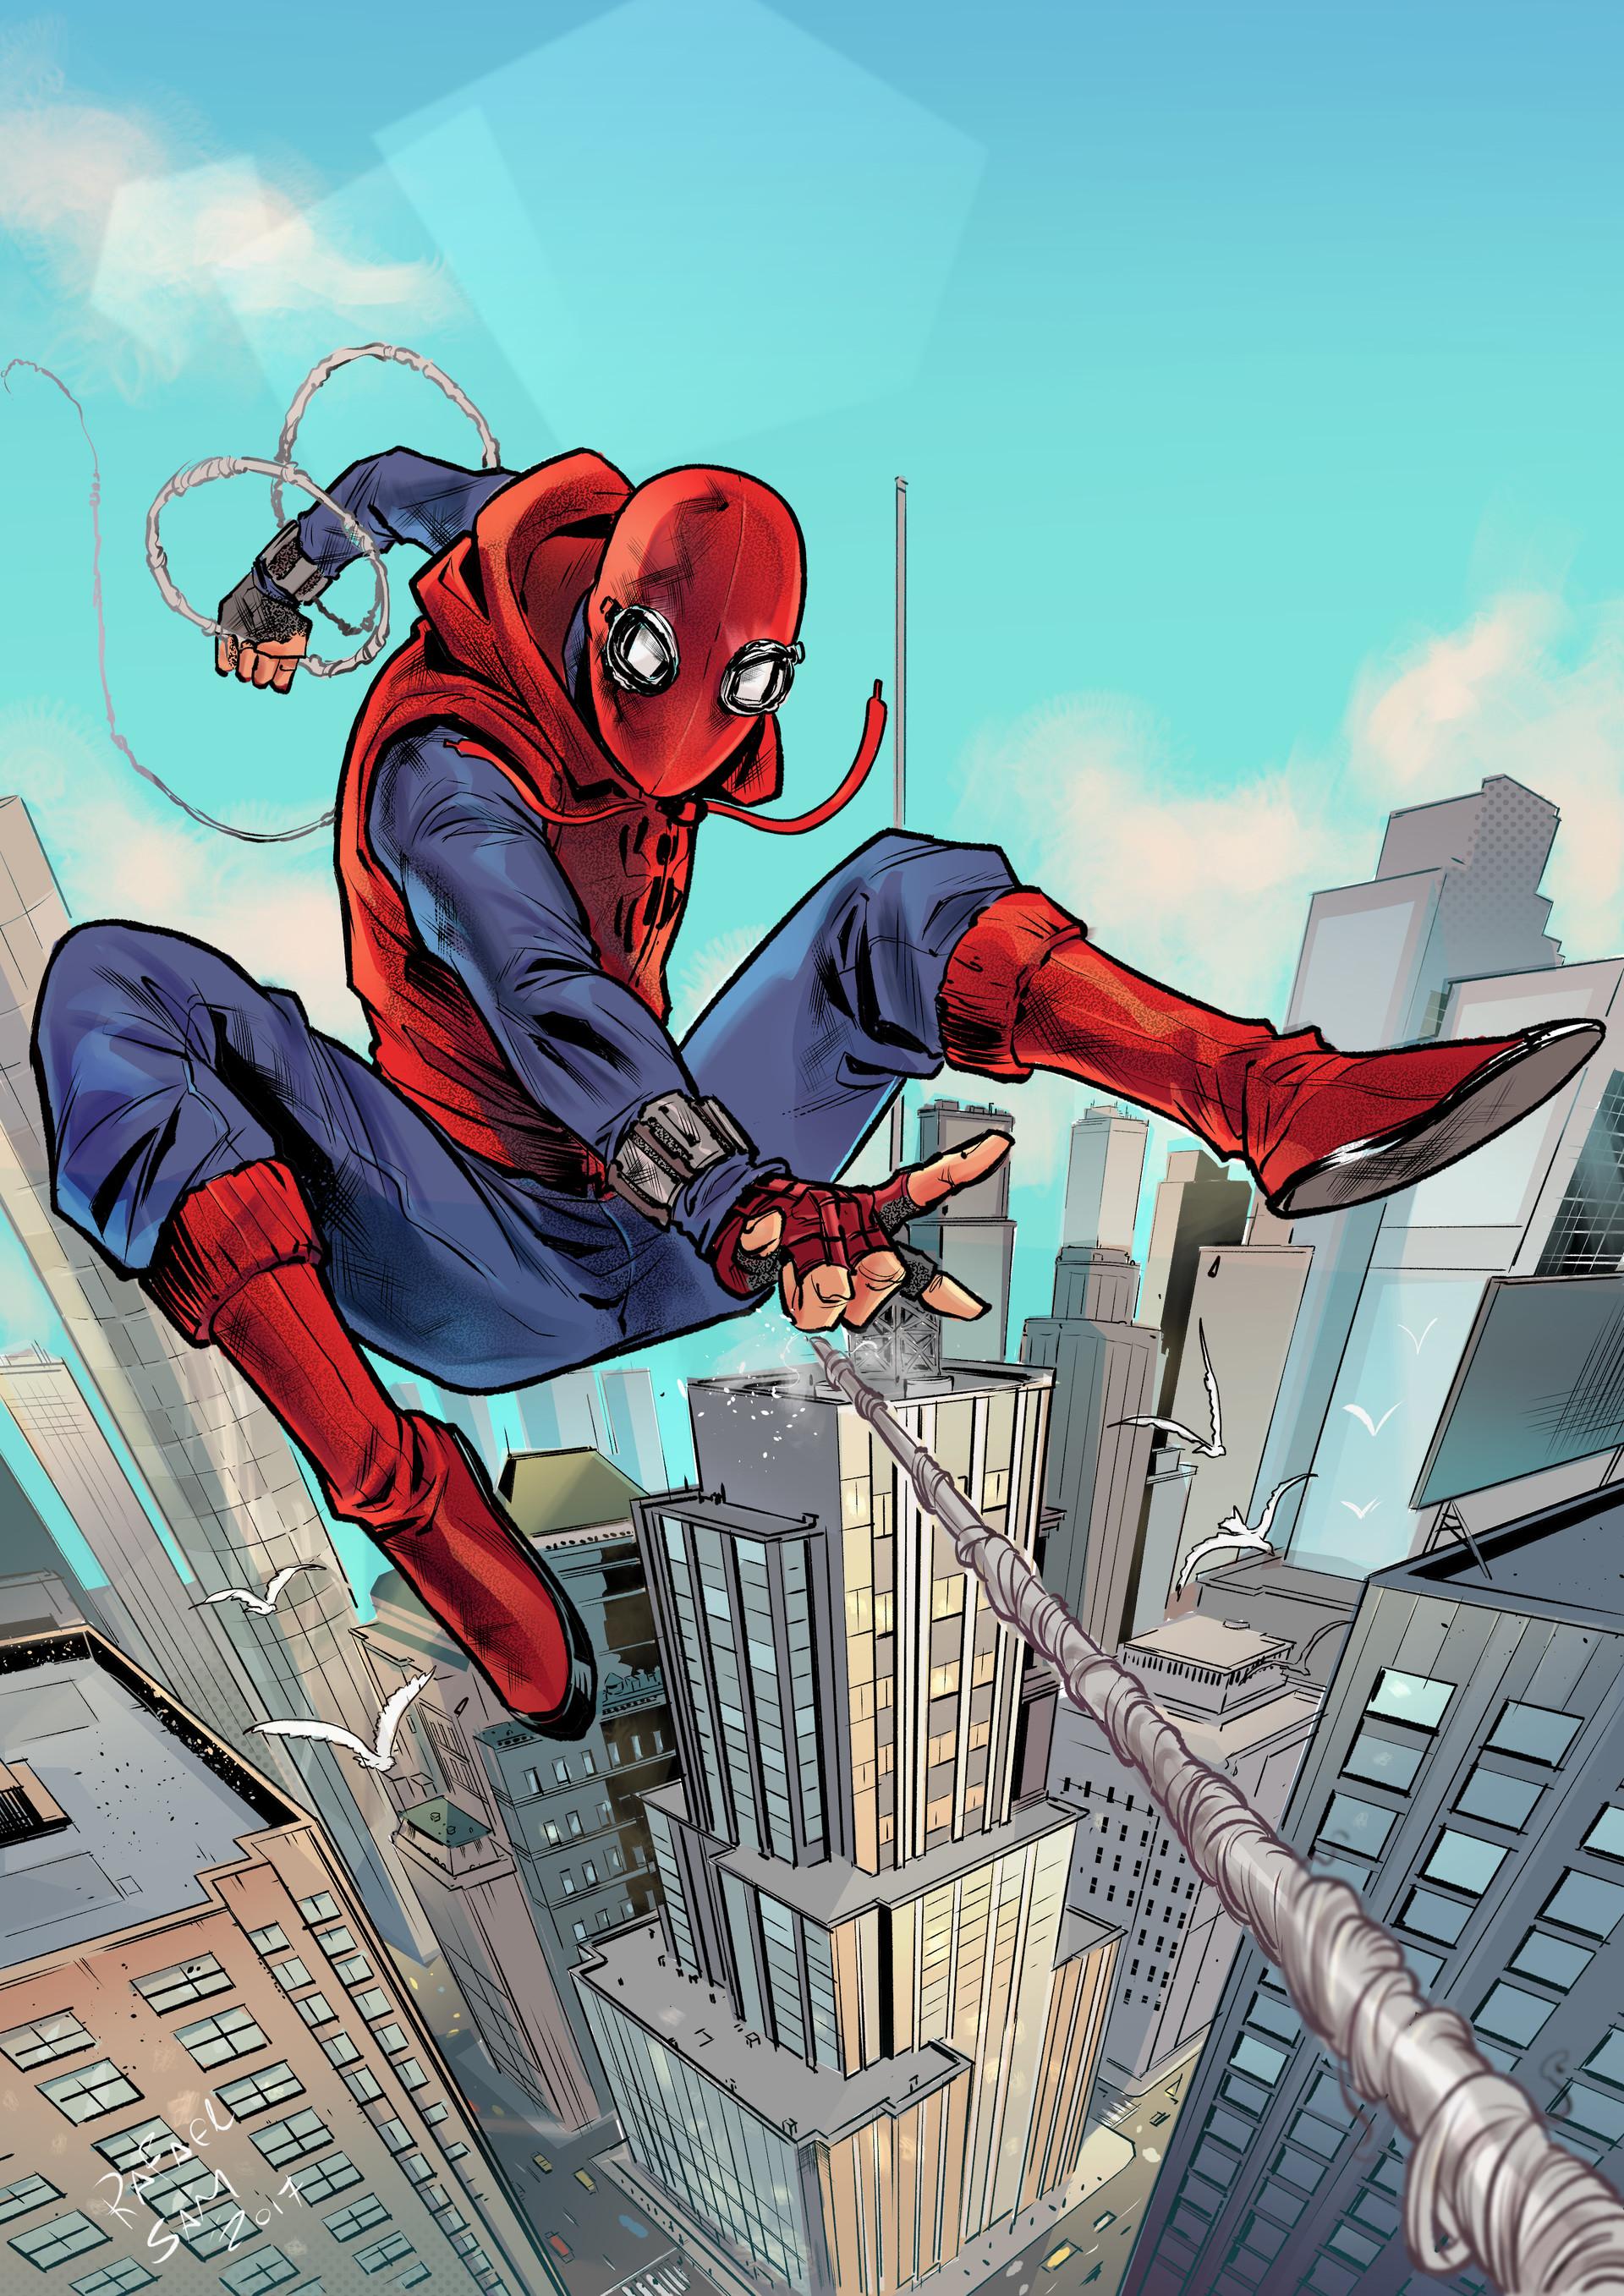 Wallpaper : Rafael Sam, illustration, Marvel Comics, Spider